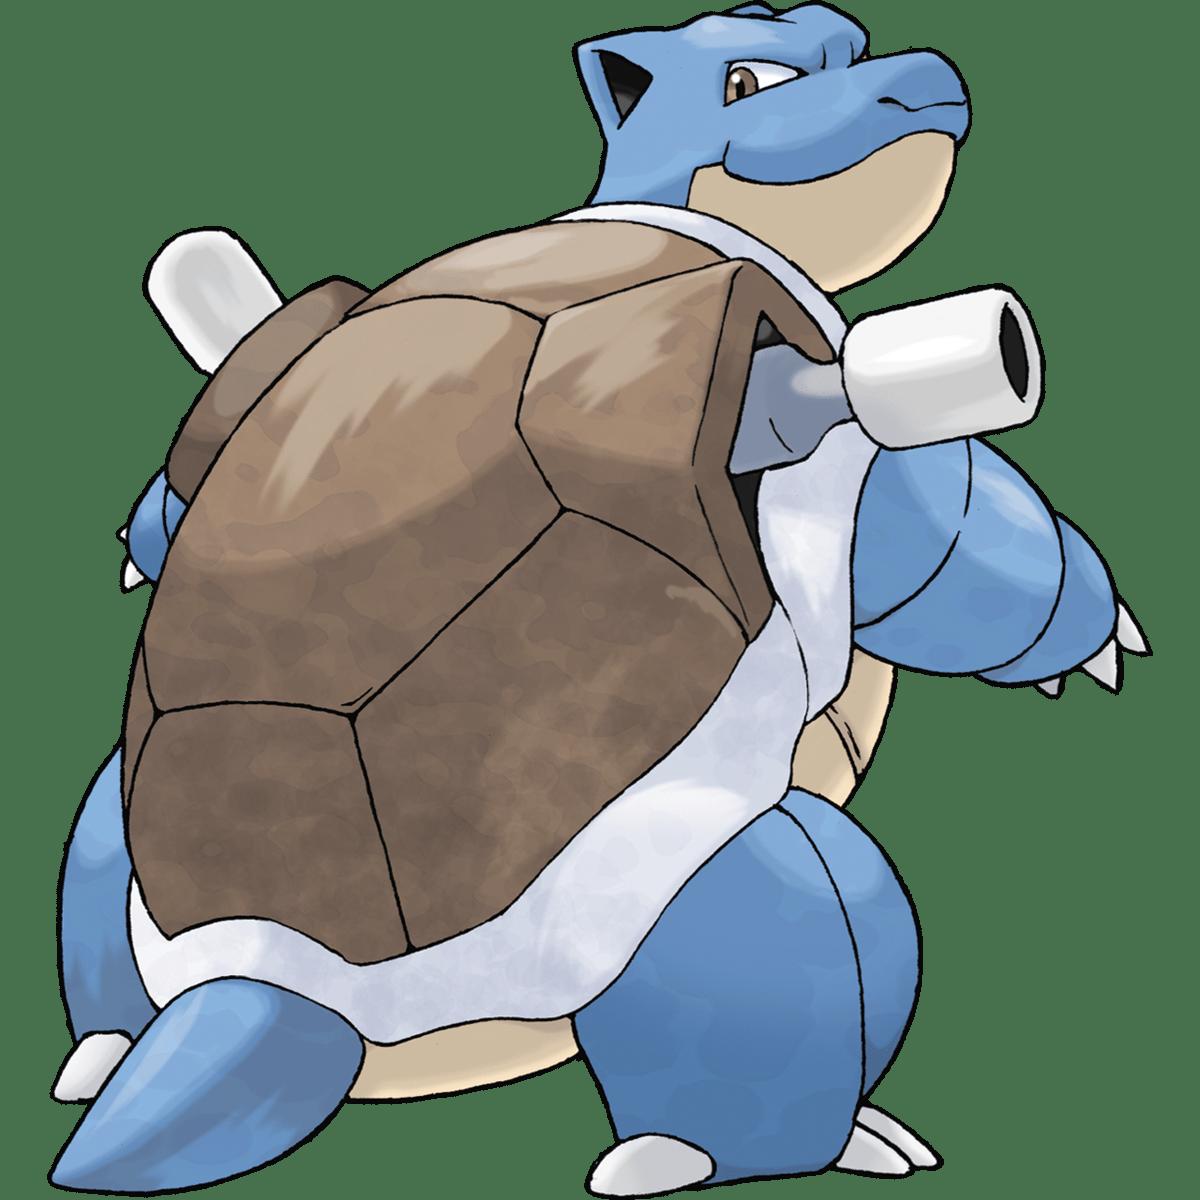 Blastoise, one of the best Water type Pokemon in Pokemon Let's Go